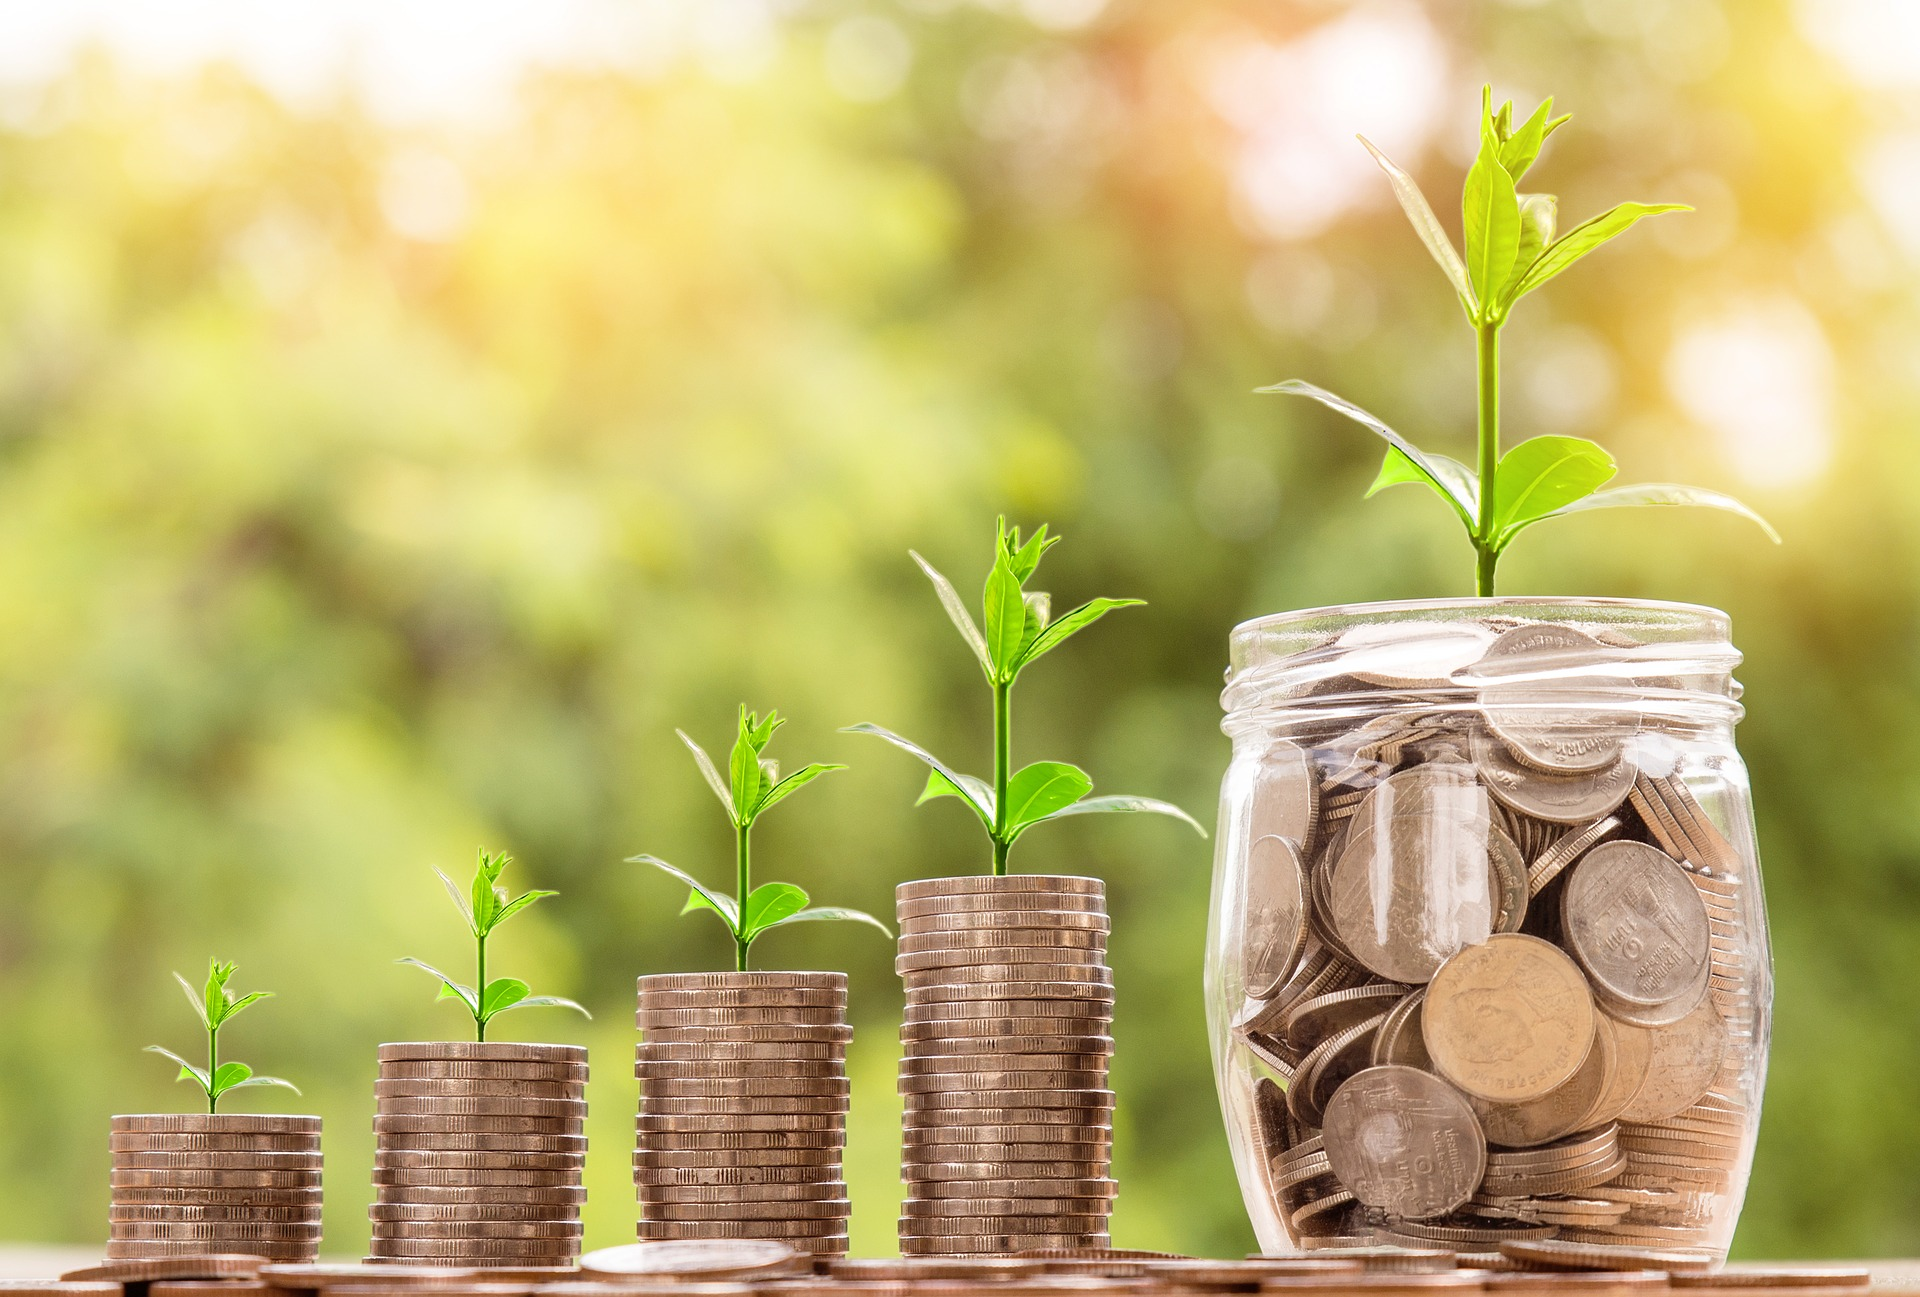 O que preciso para calcular a rentabilidade da minha empresa?